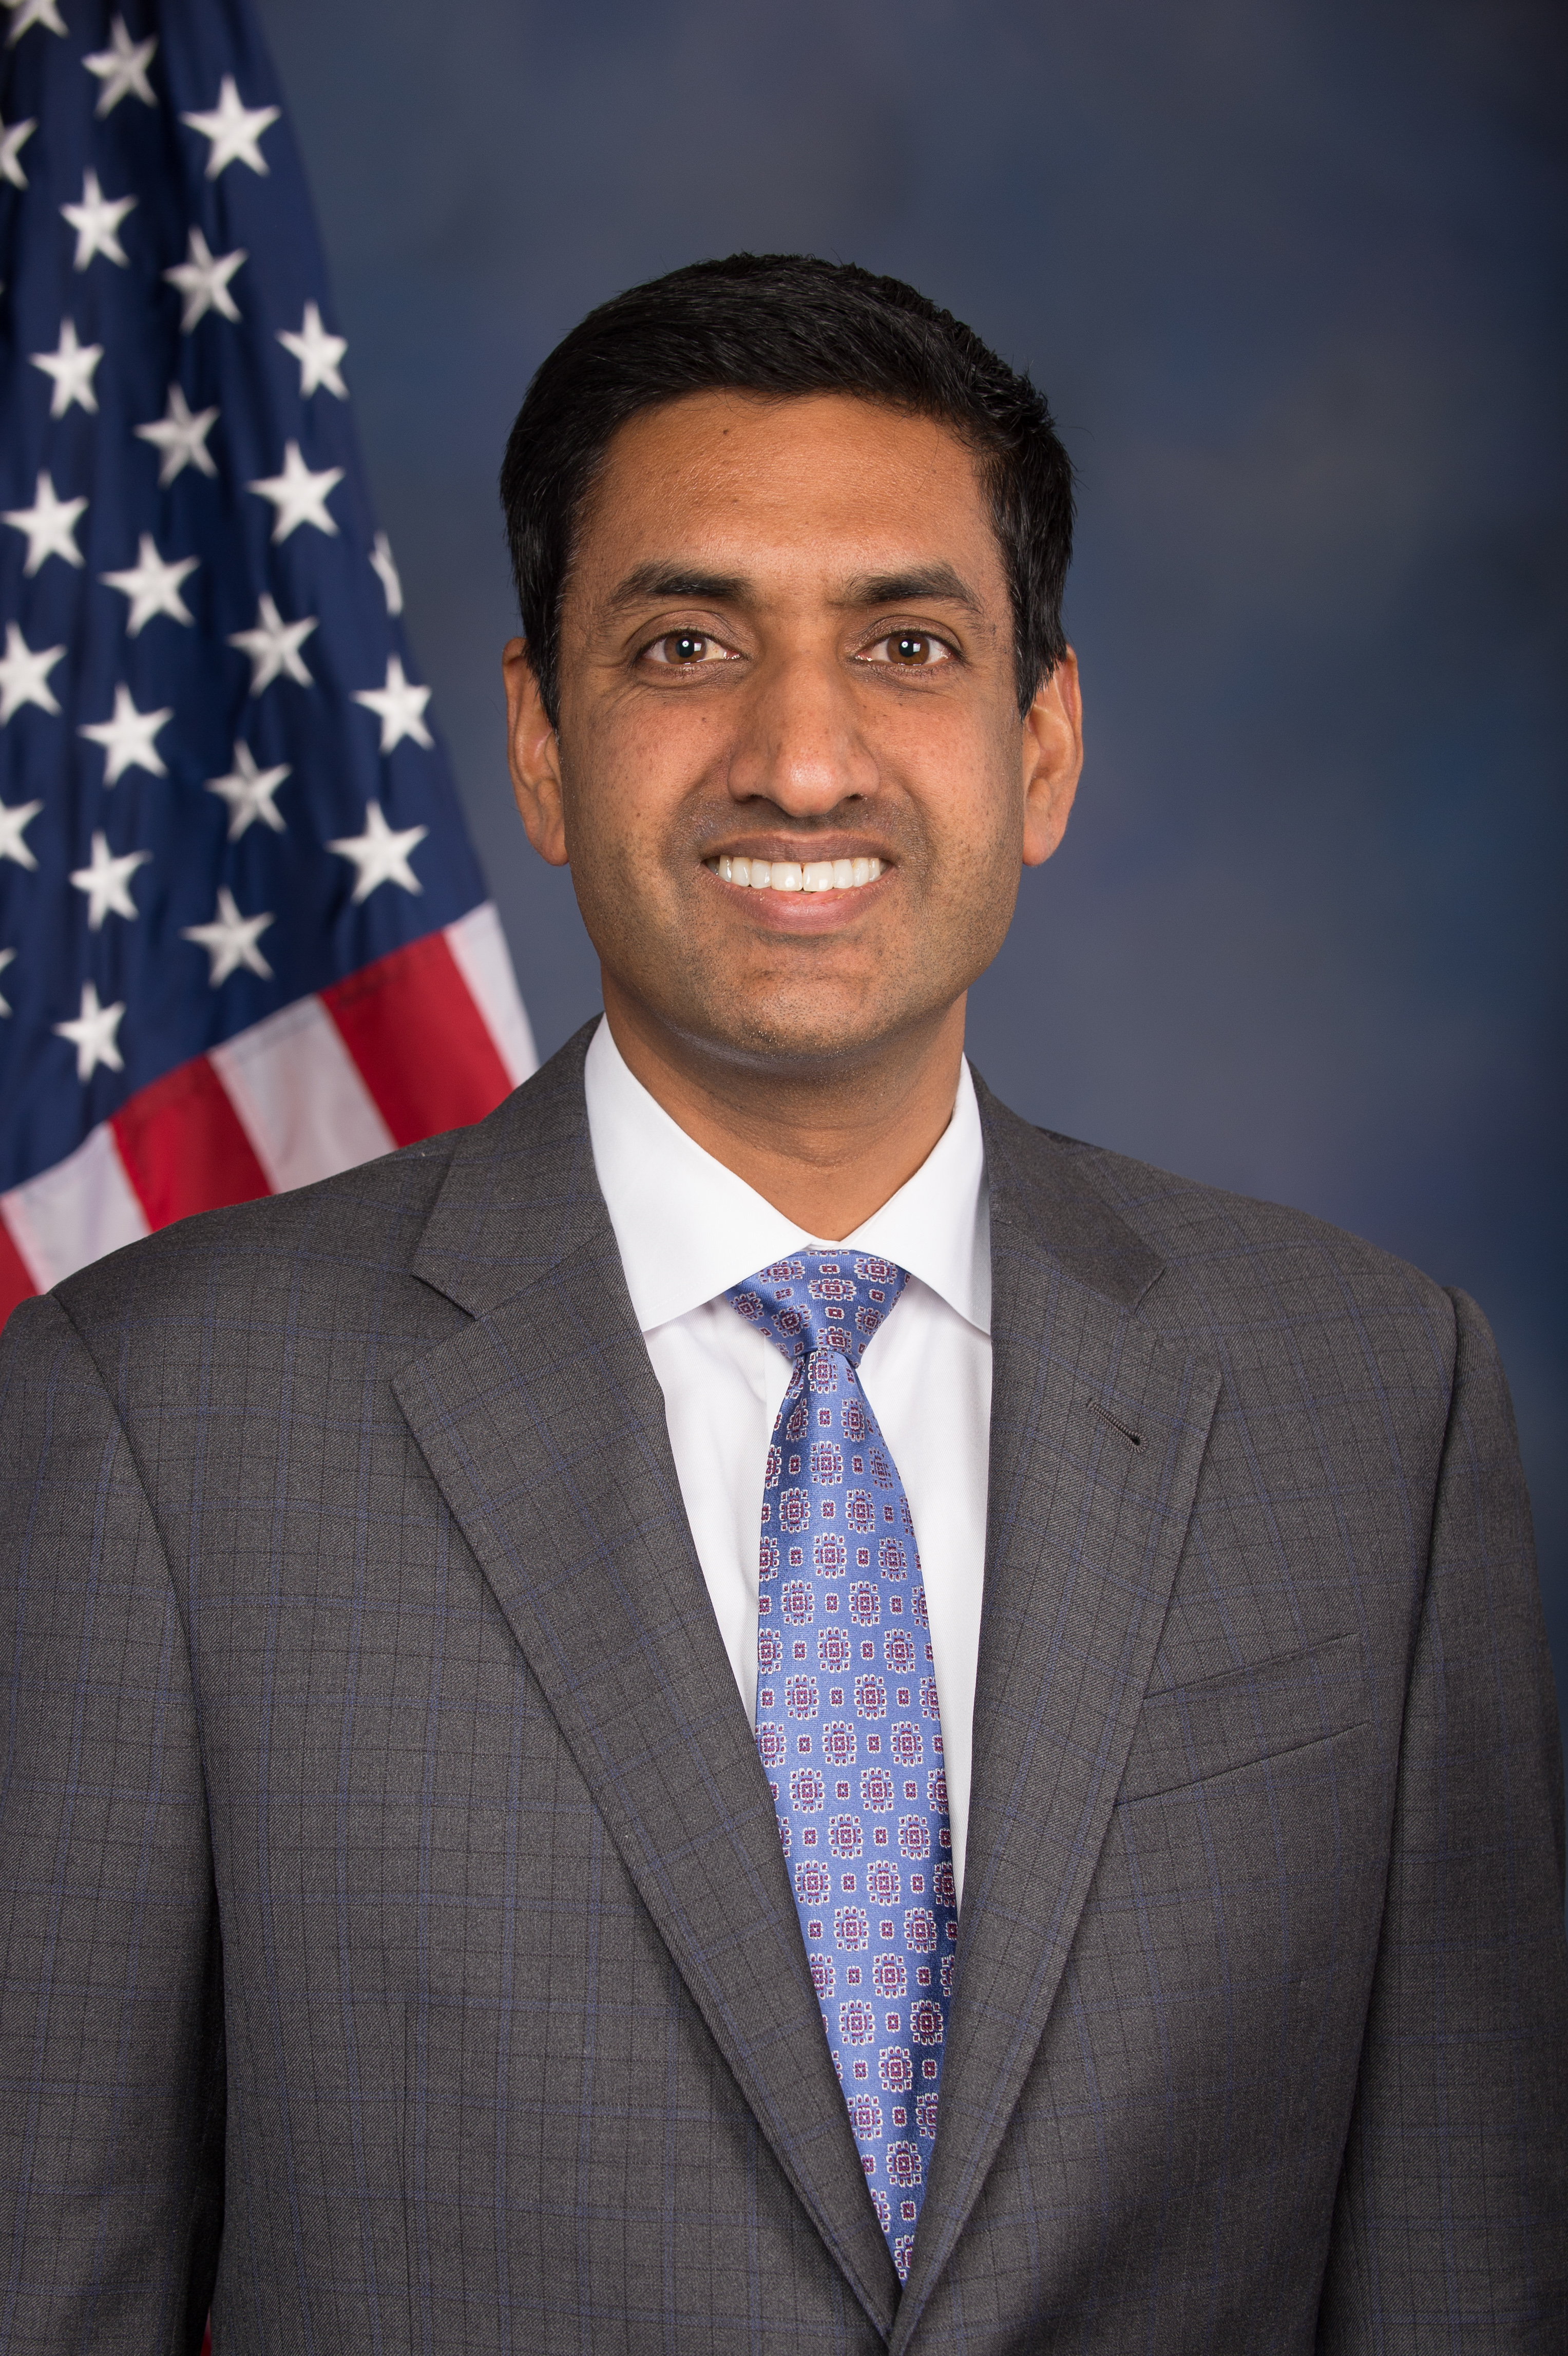 Indian-American Congressman Ro Khanna